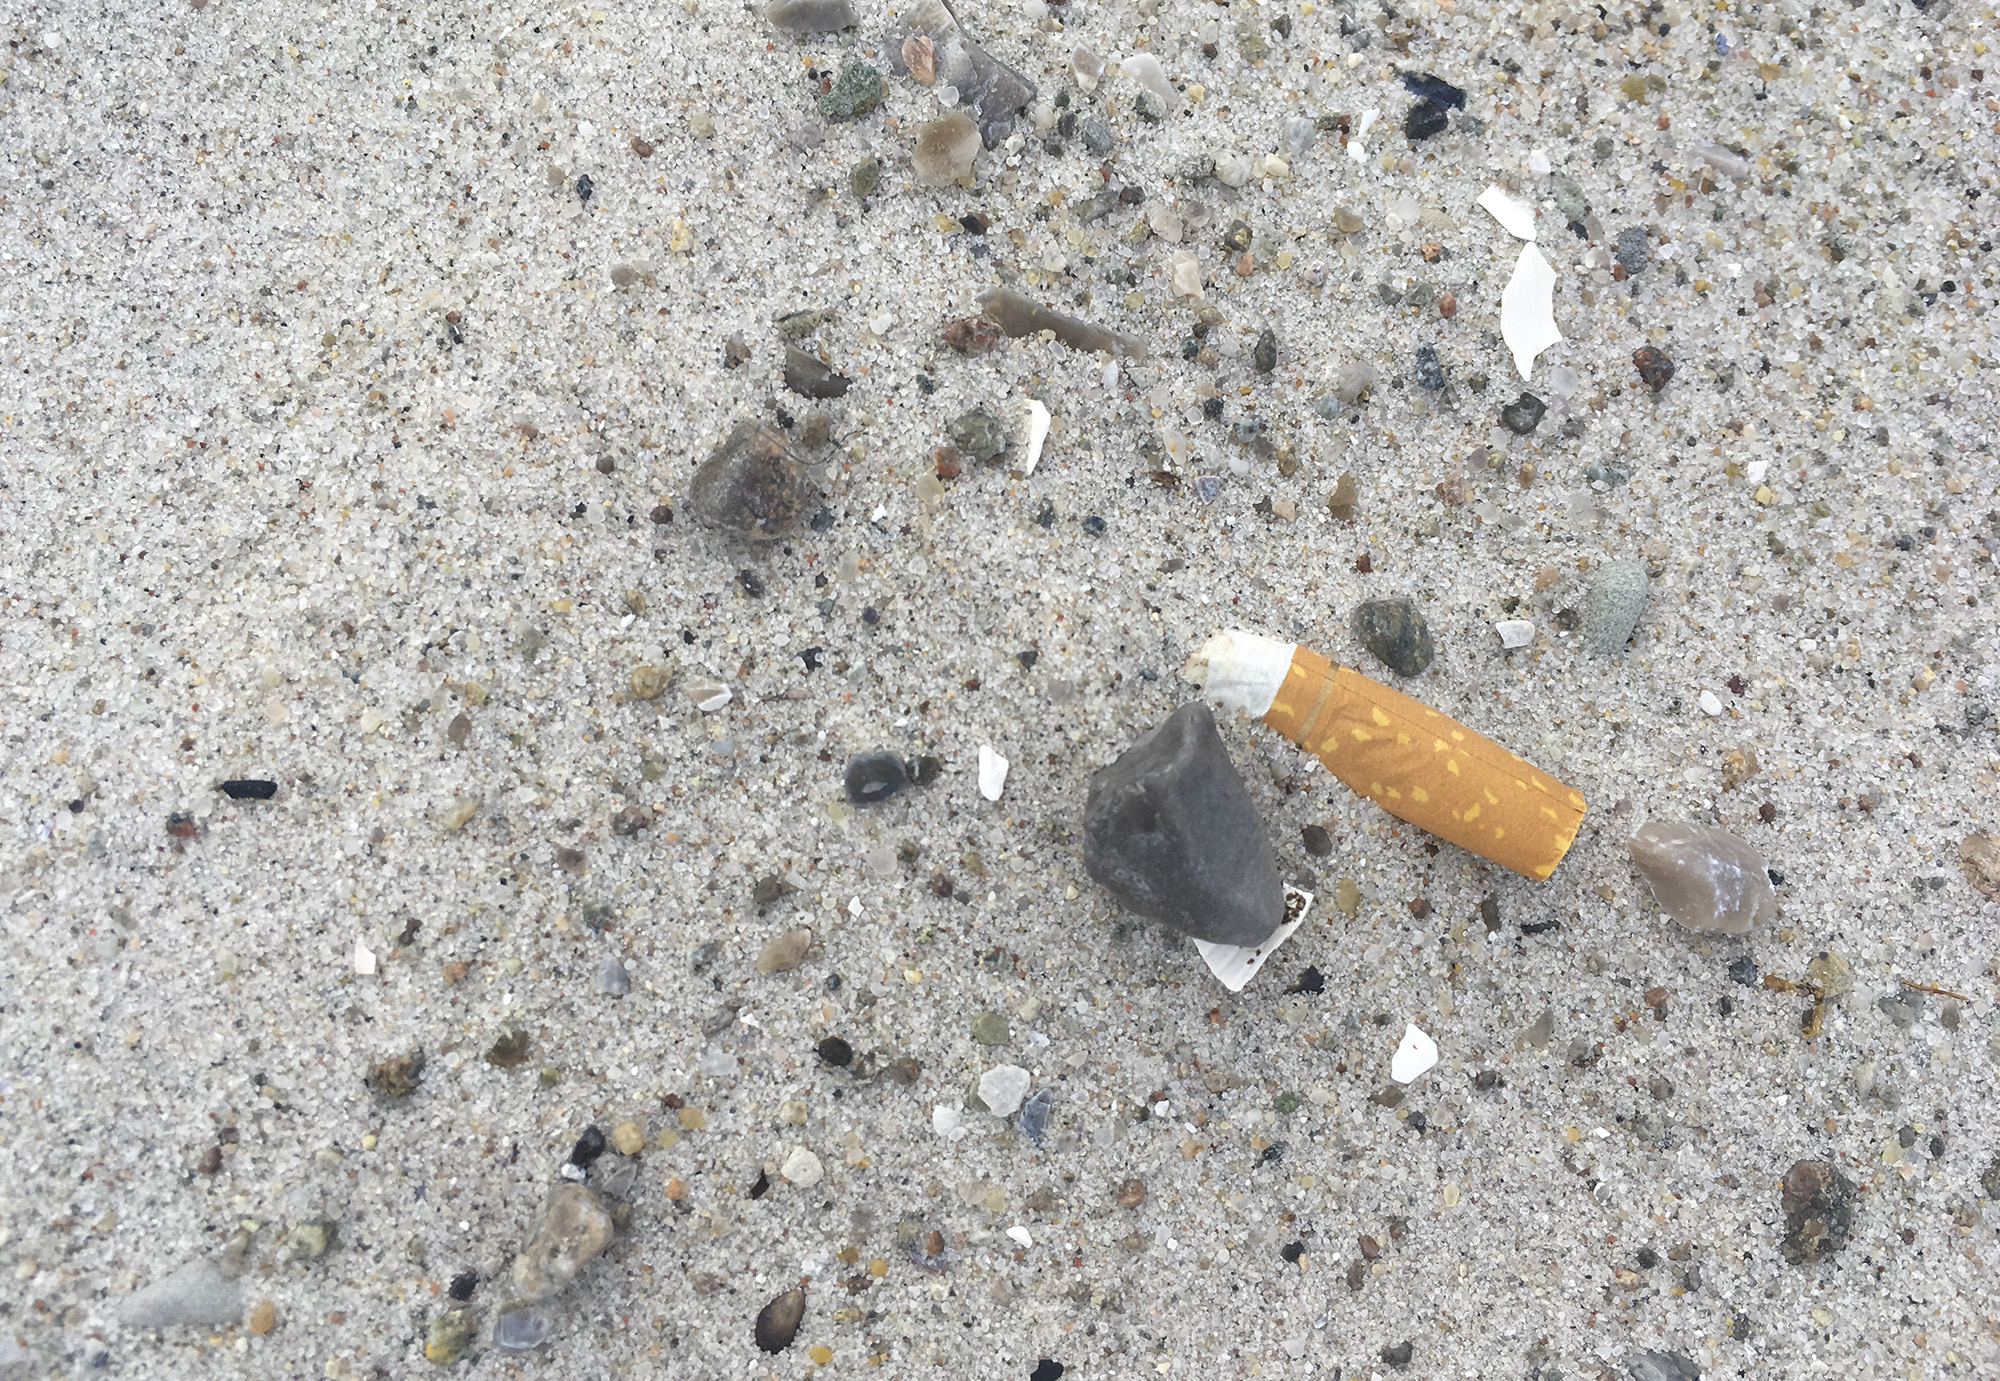 Echt eklig: Zigarettenkippen am Strand